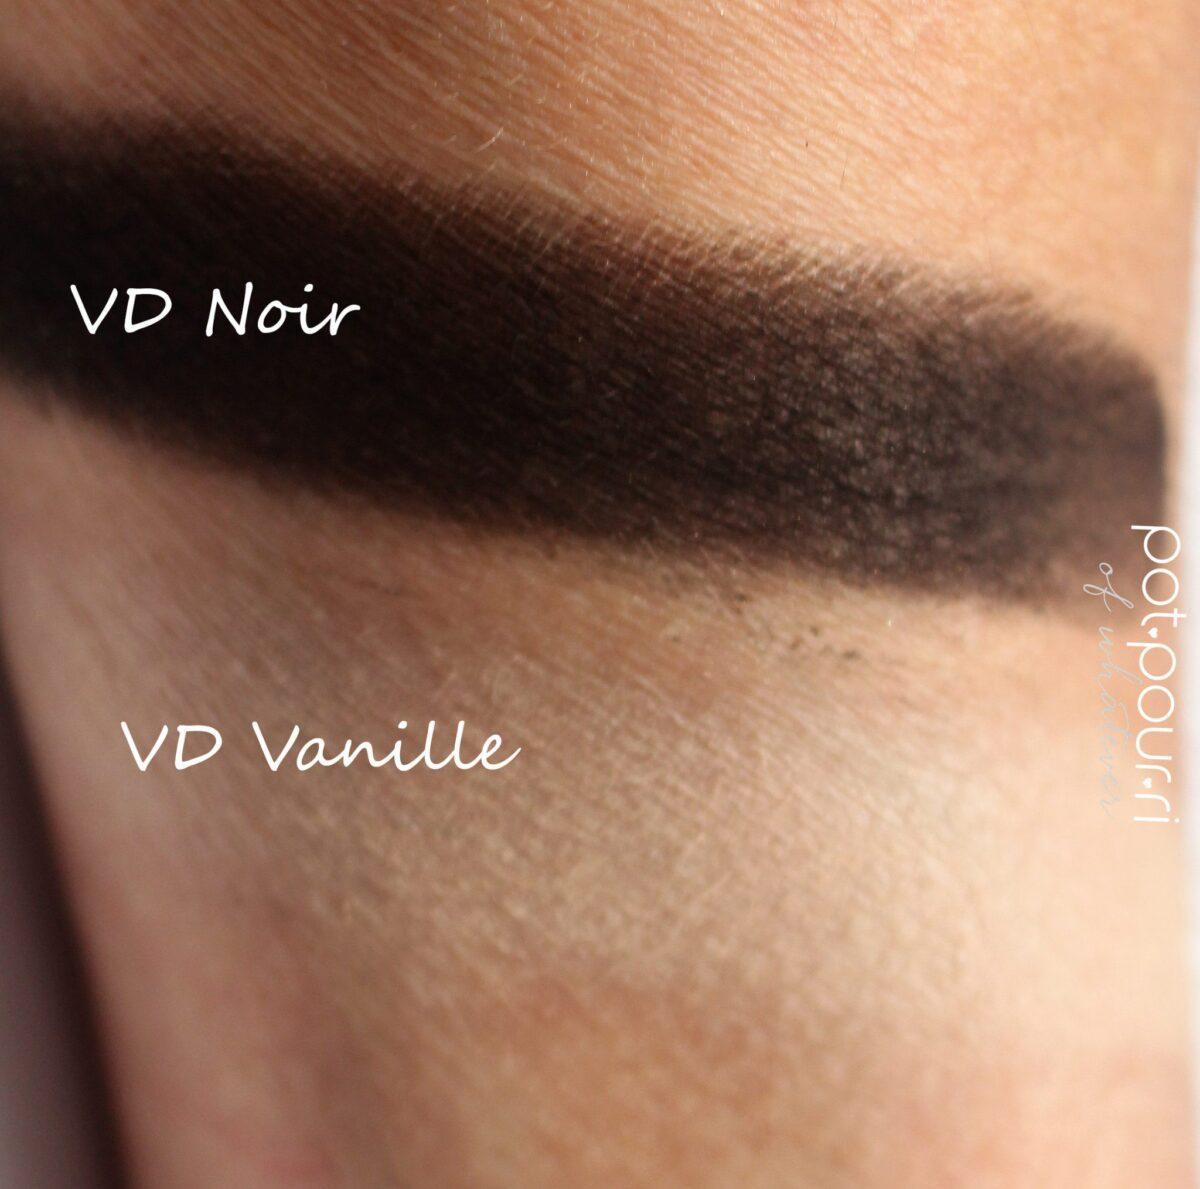 noir/vanille swatched